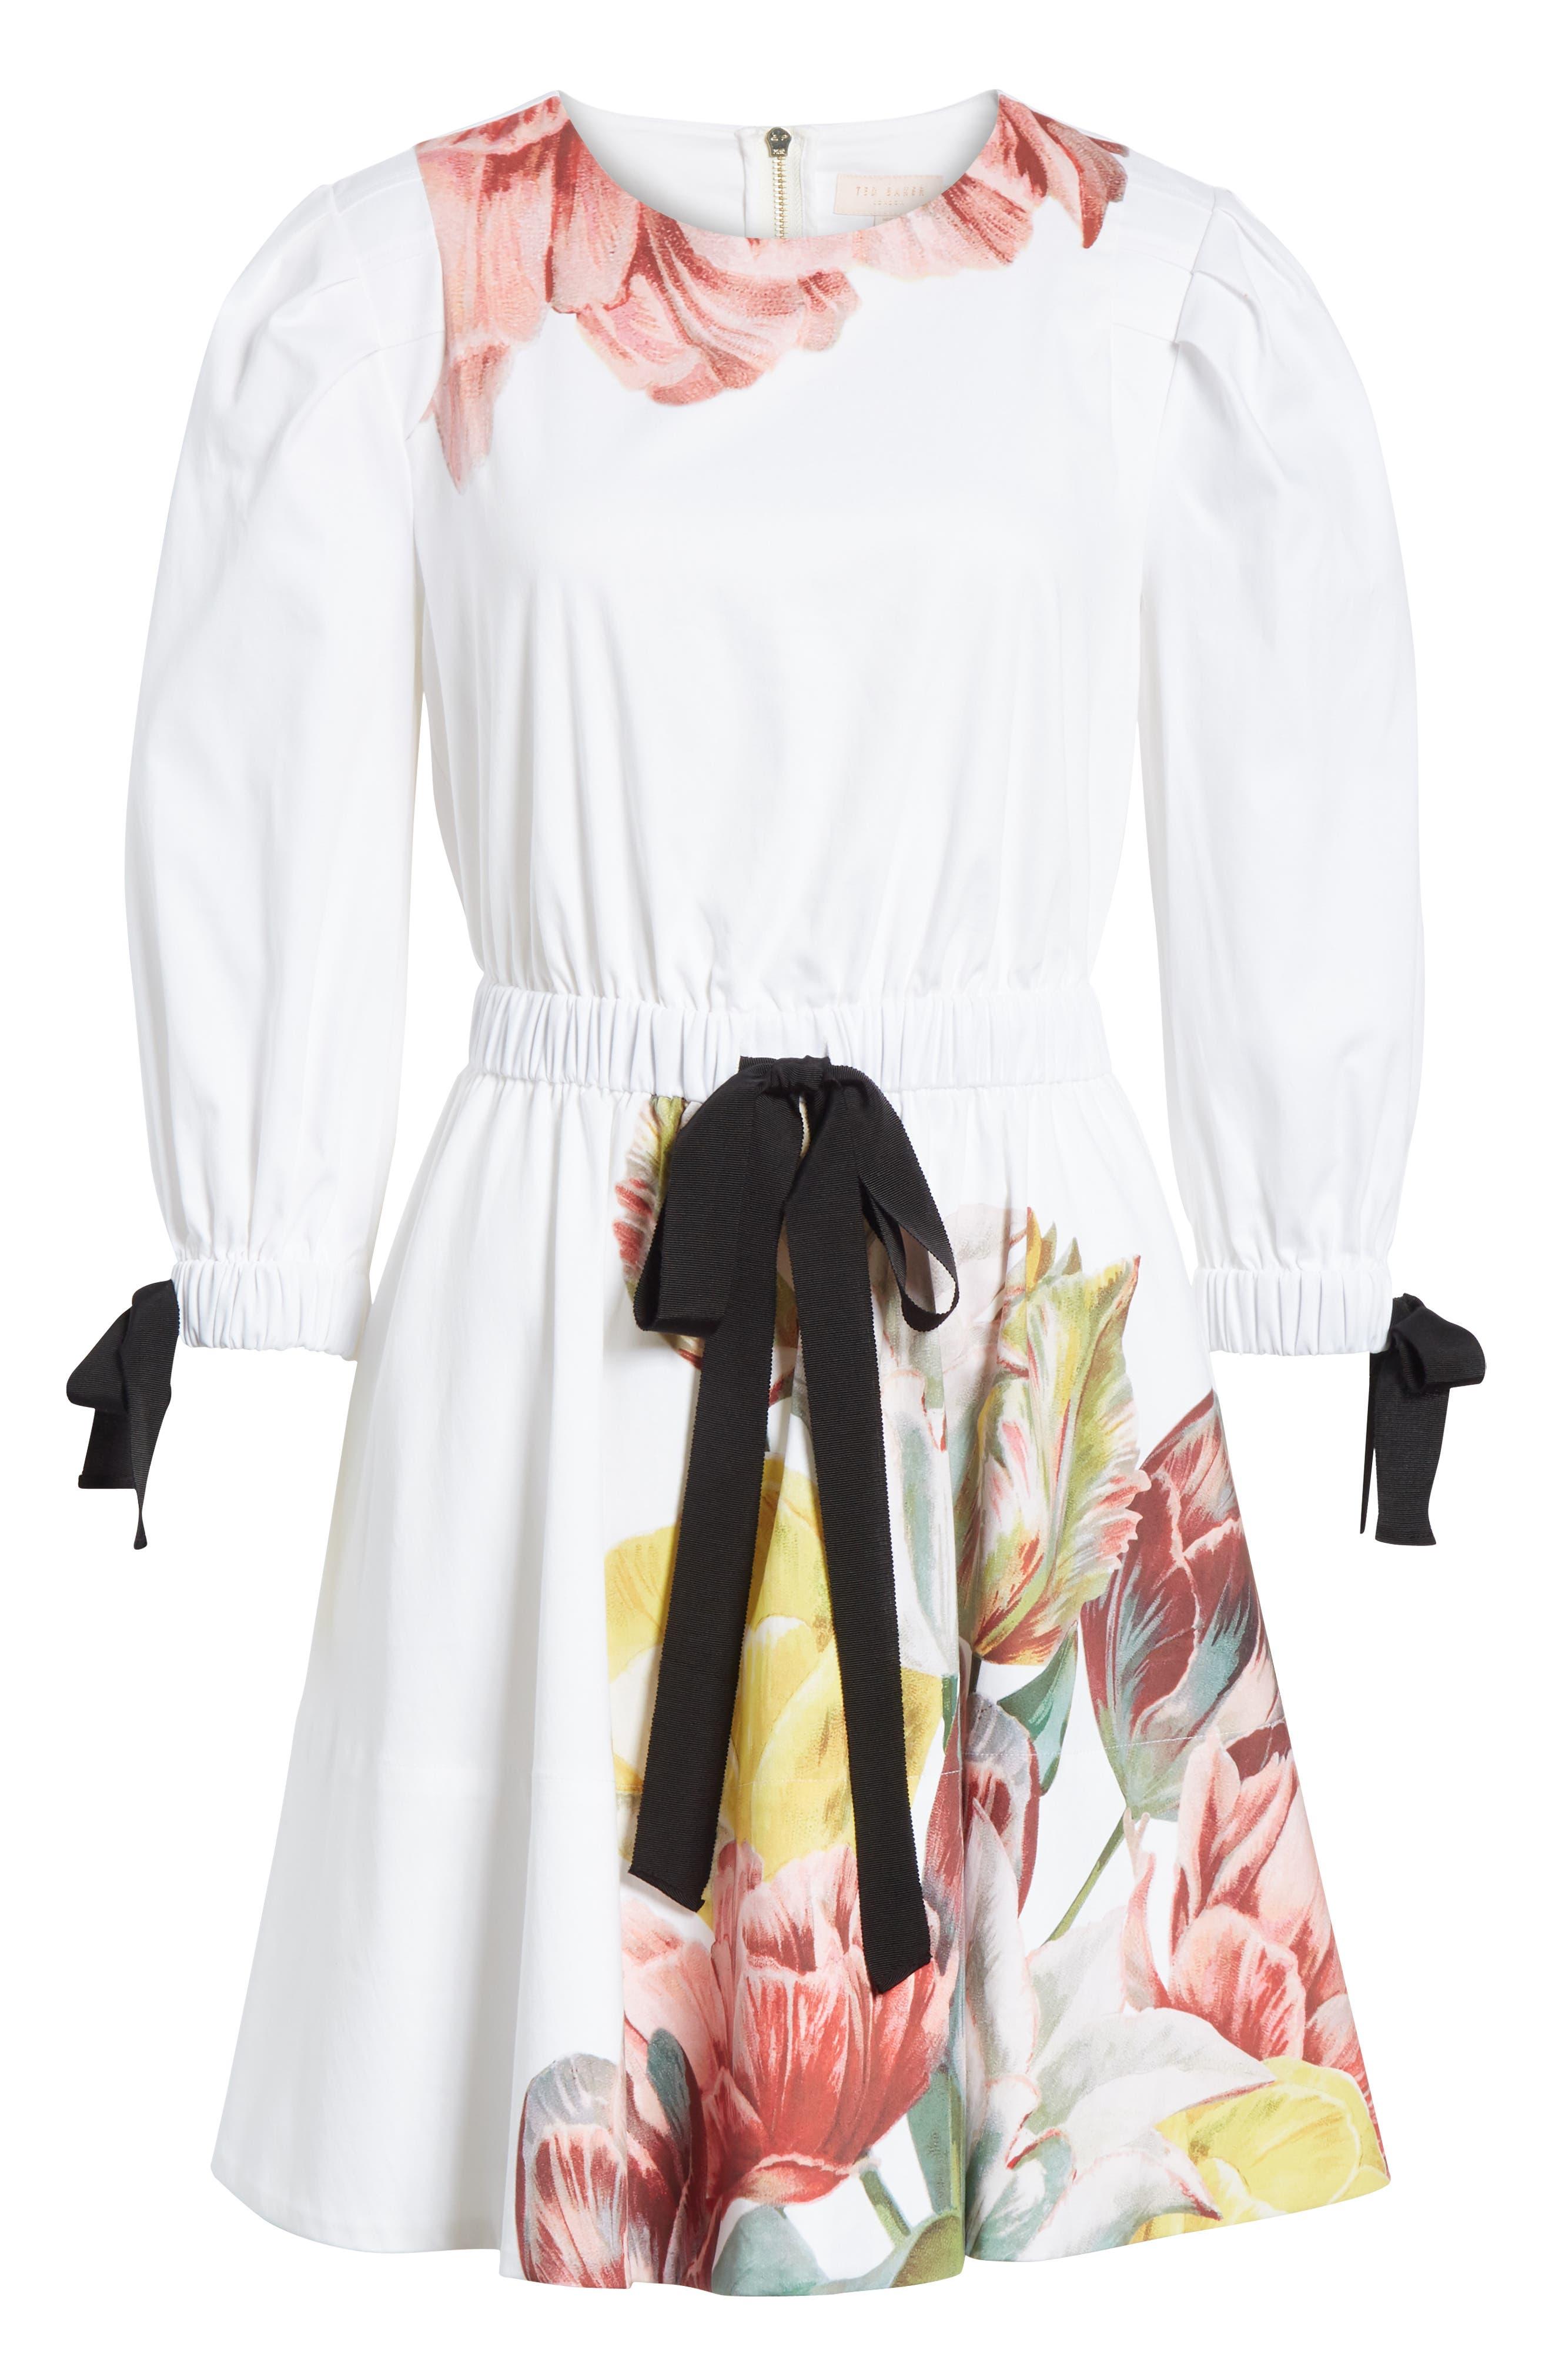 Tranquility Stretch Cotton Dress,                             Alternate thumbnail 6, color,                             110